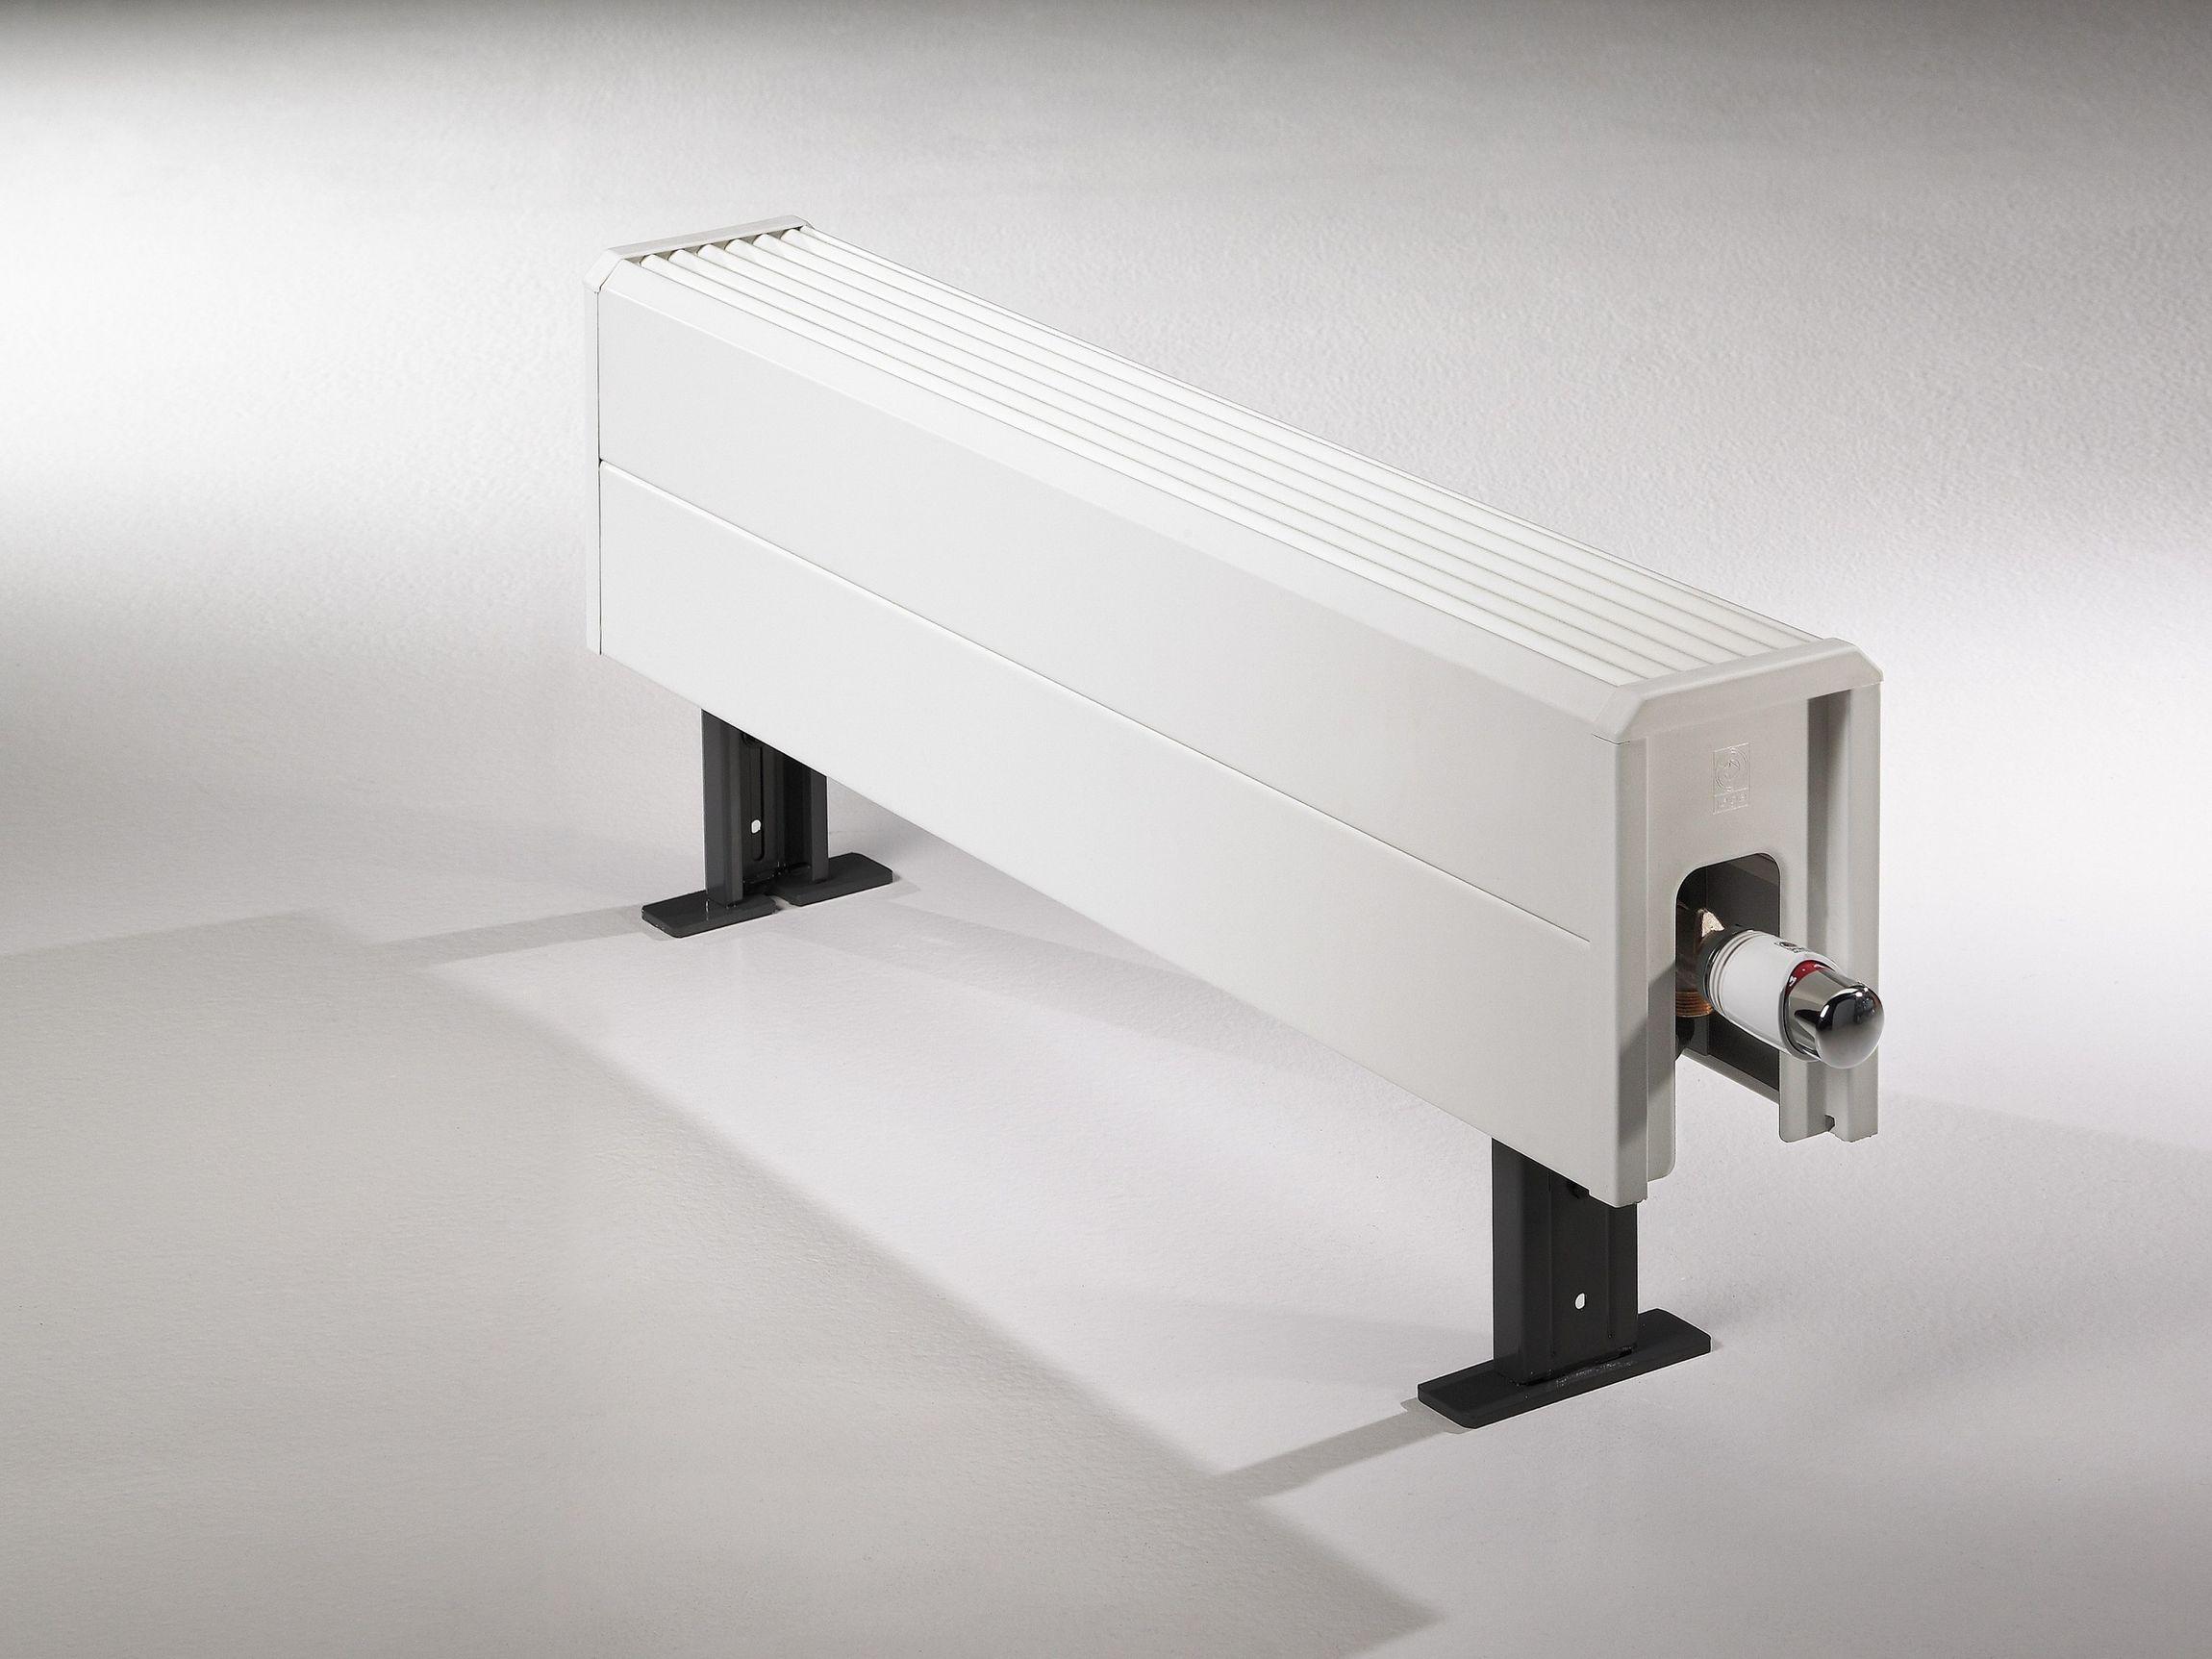 standheizk rper mit hoher leistung konvektor f r brennwertkessel. Black Bedroom Furniture Sets. Home Design Ideas